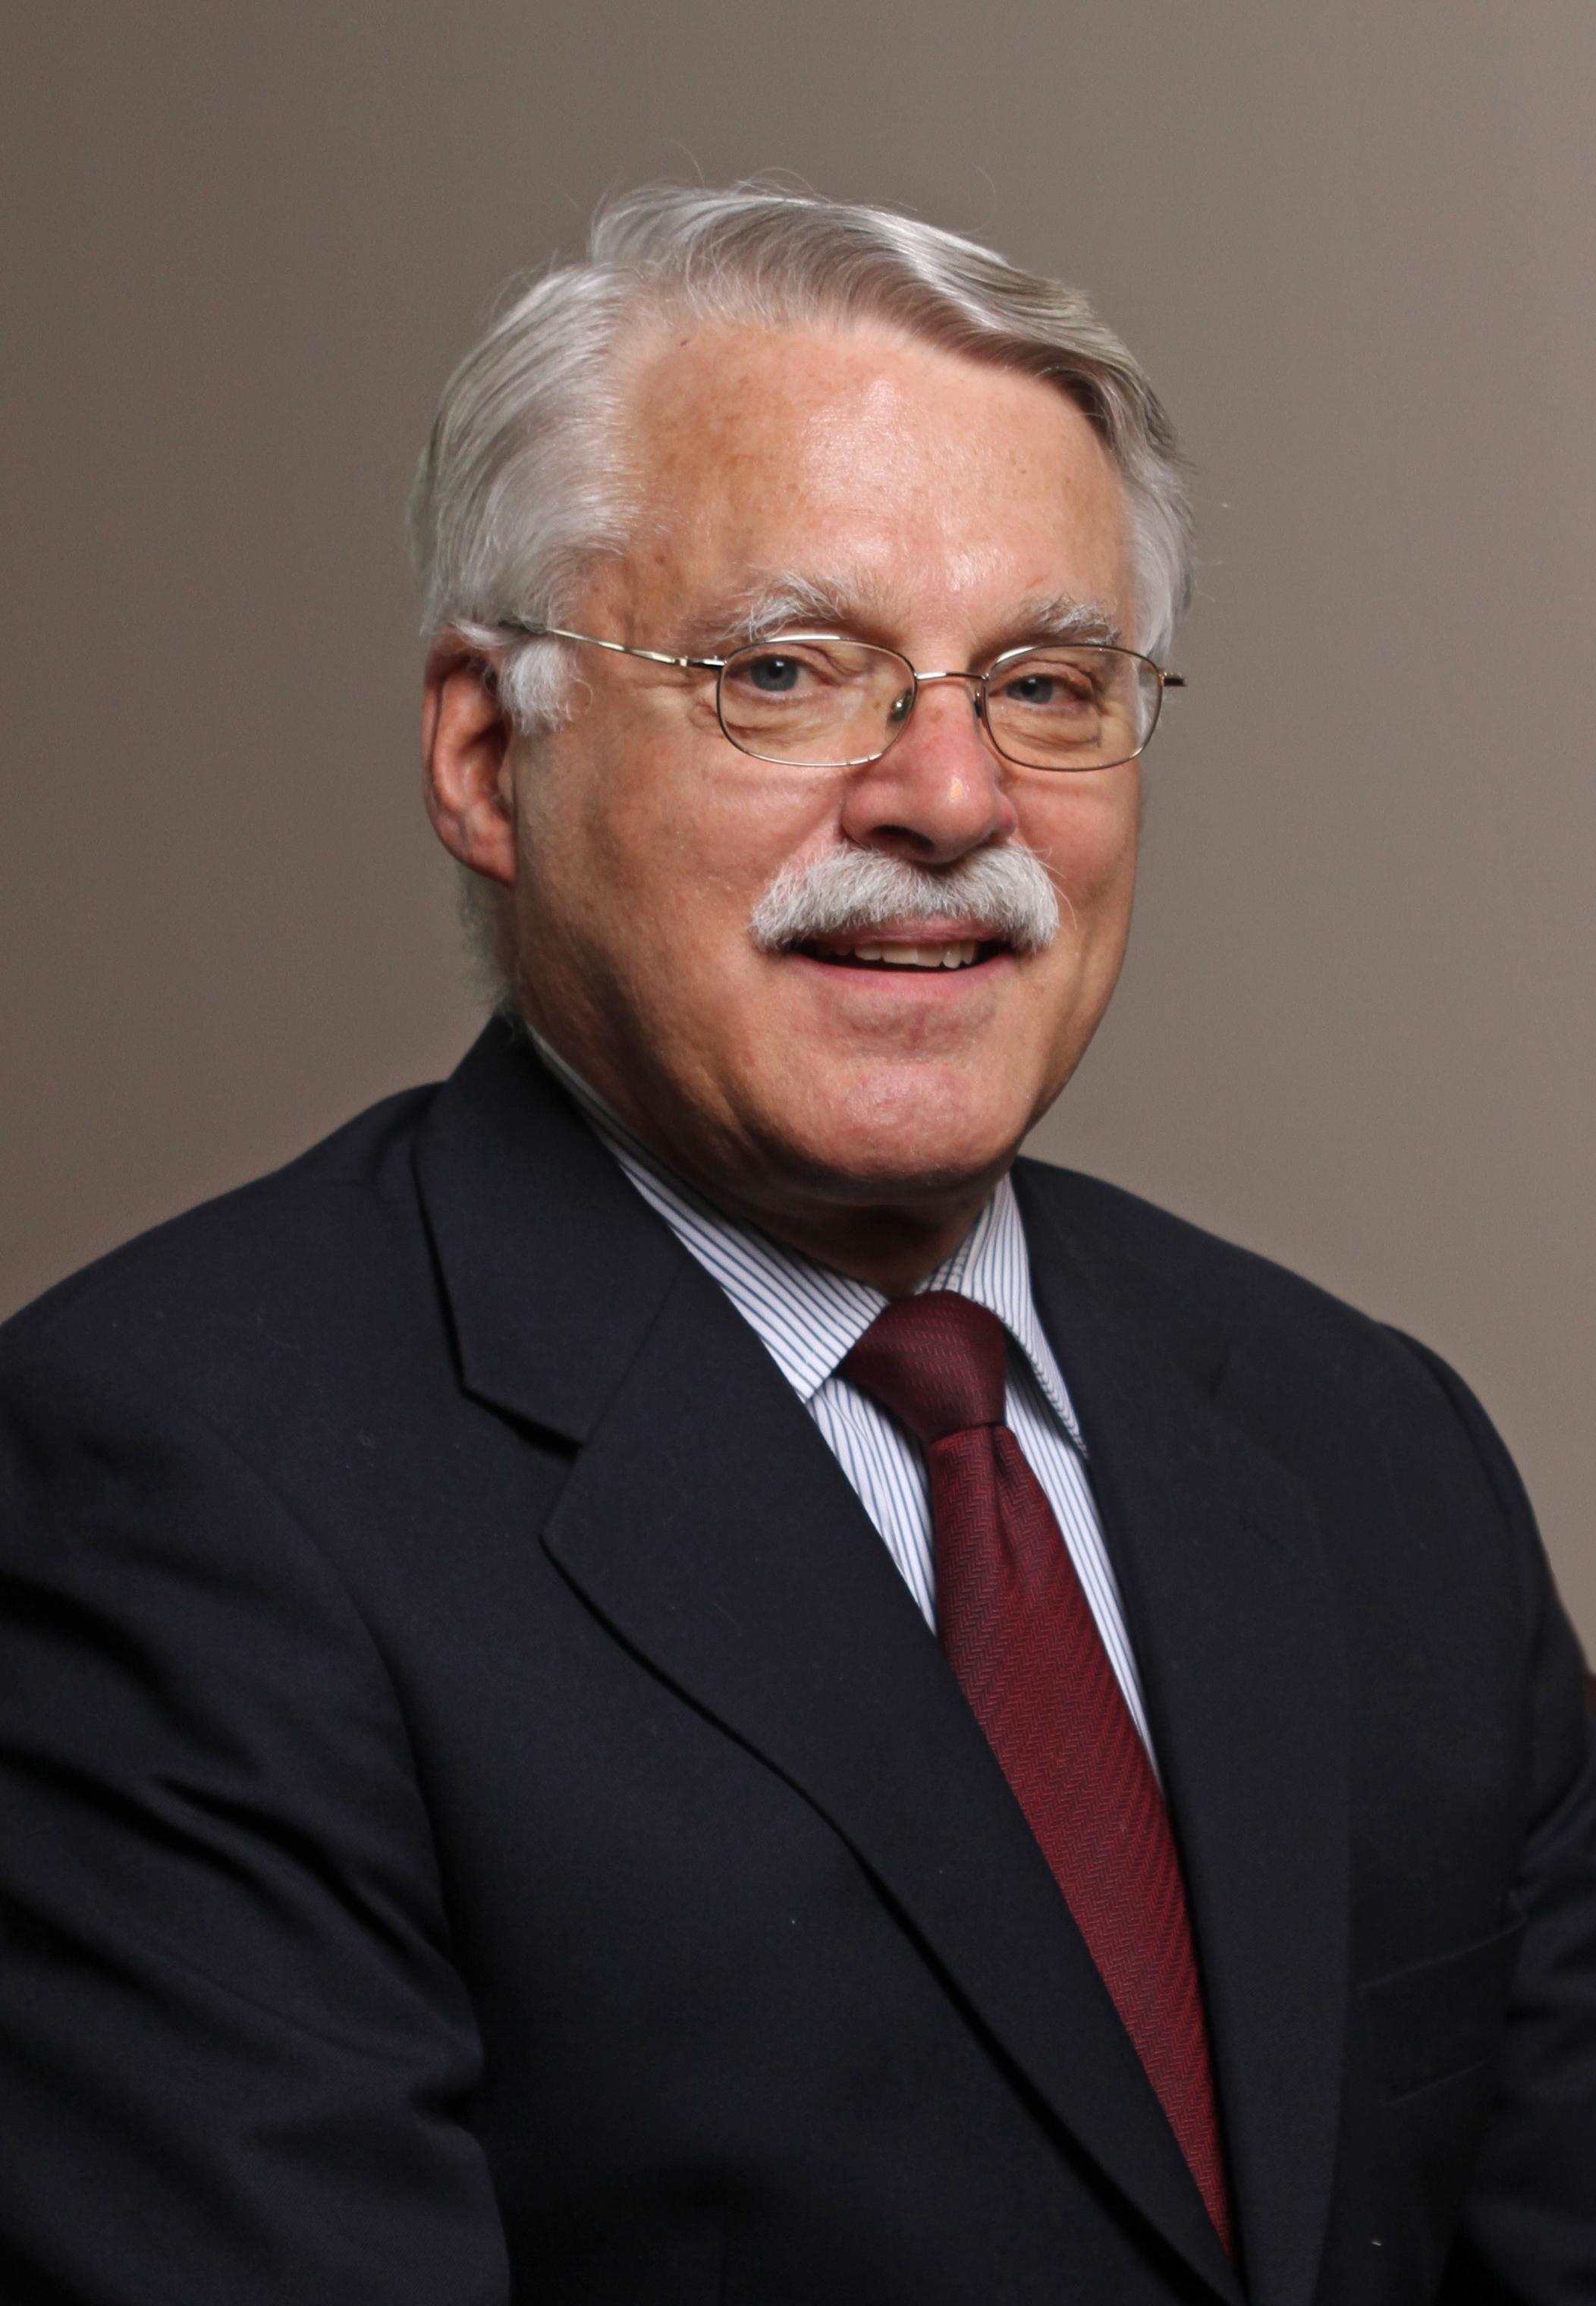 Mark Amstutz